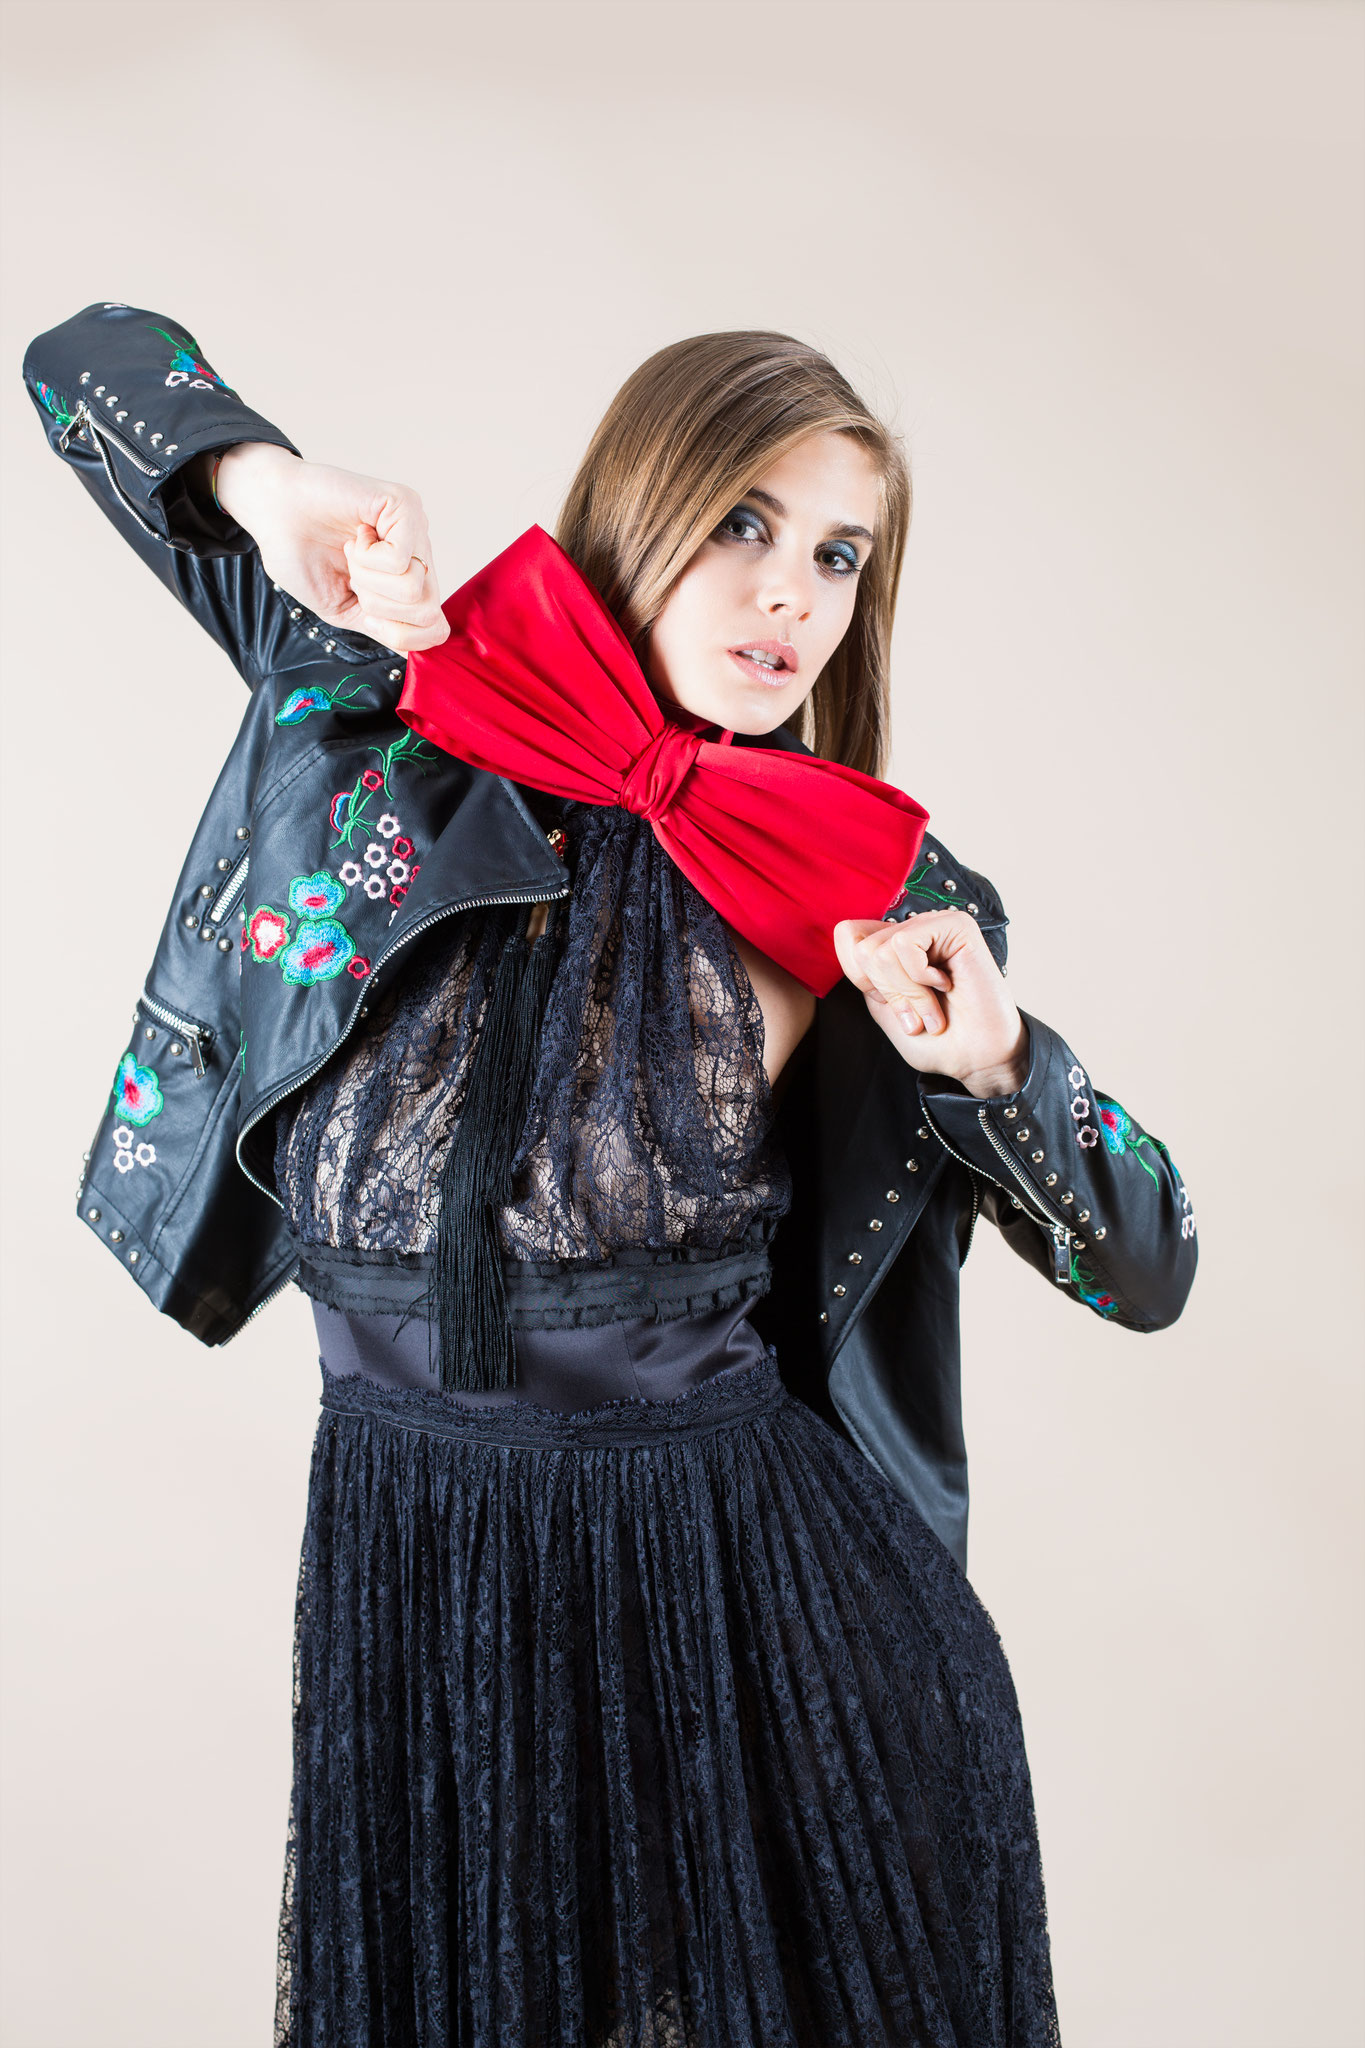 Flower Fantasies - ELEGANT NYC, April 2018 Vol. 47 No. 13 - Fashion Stylist: Vesna Resch